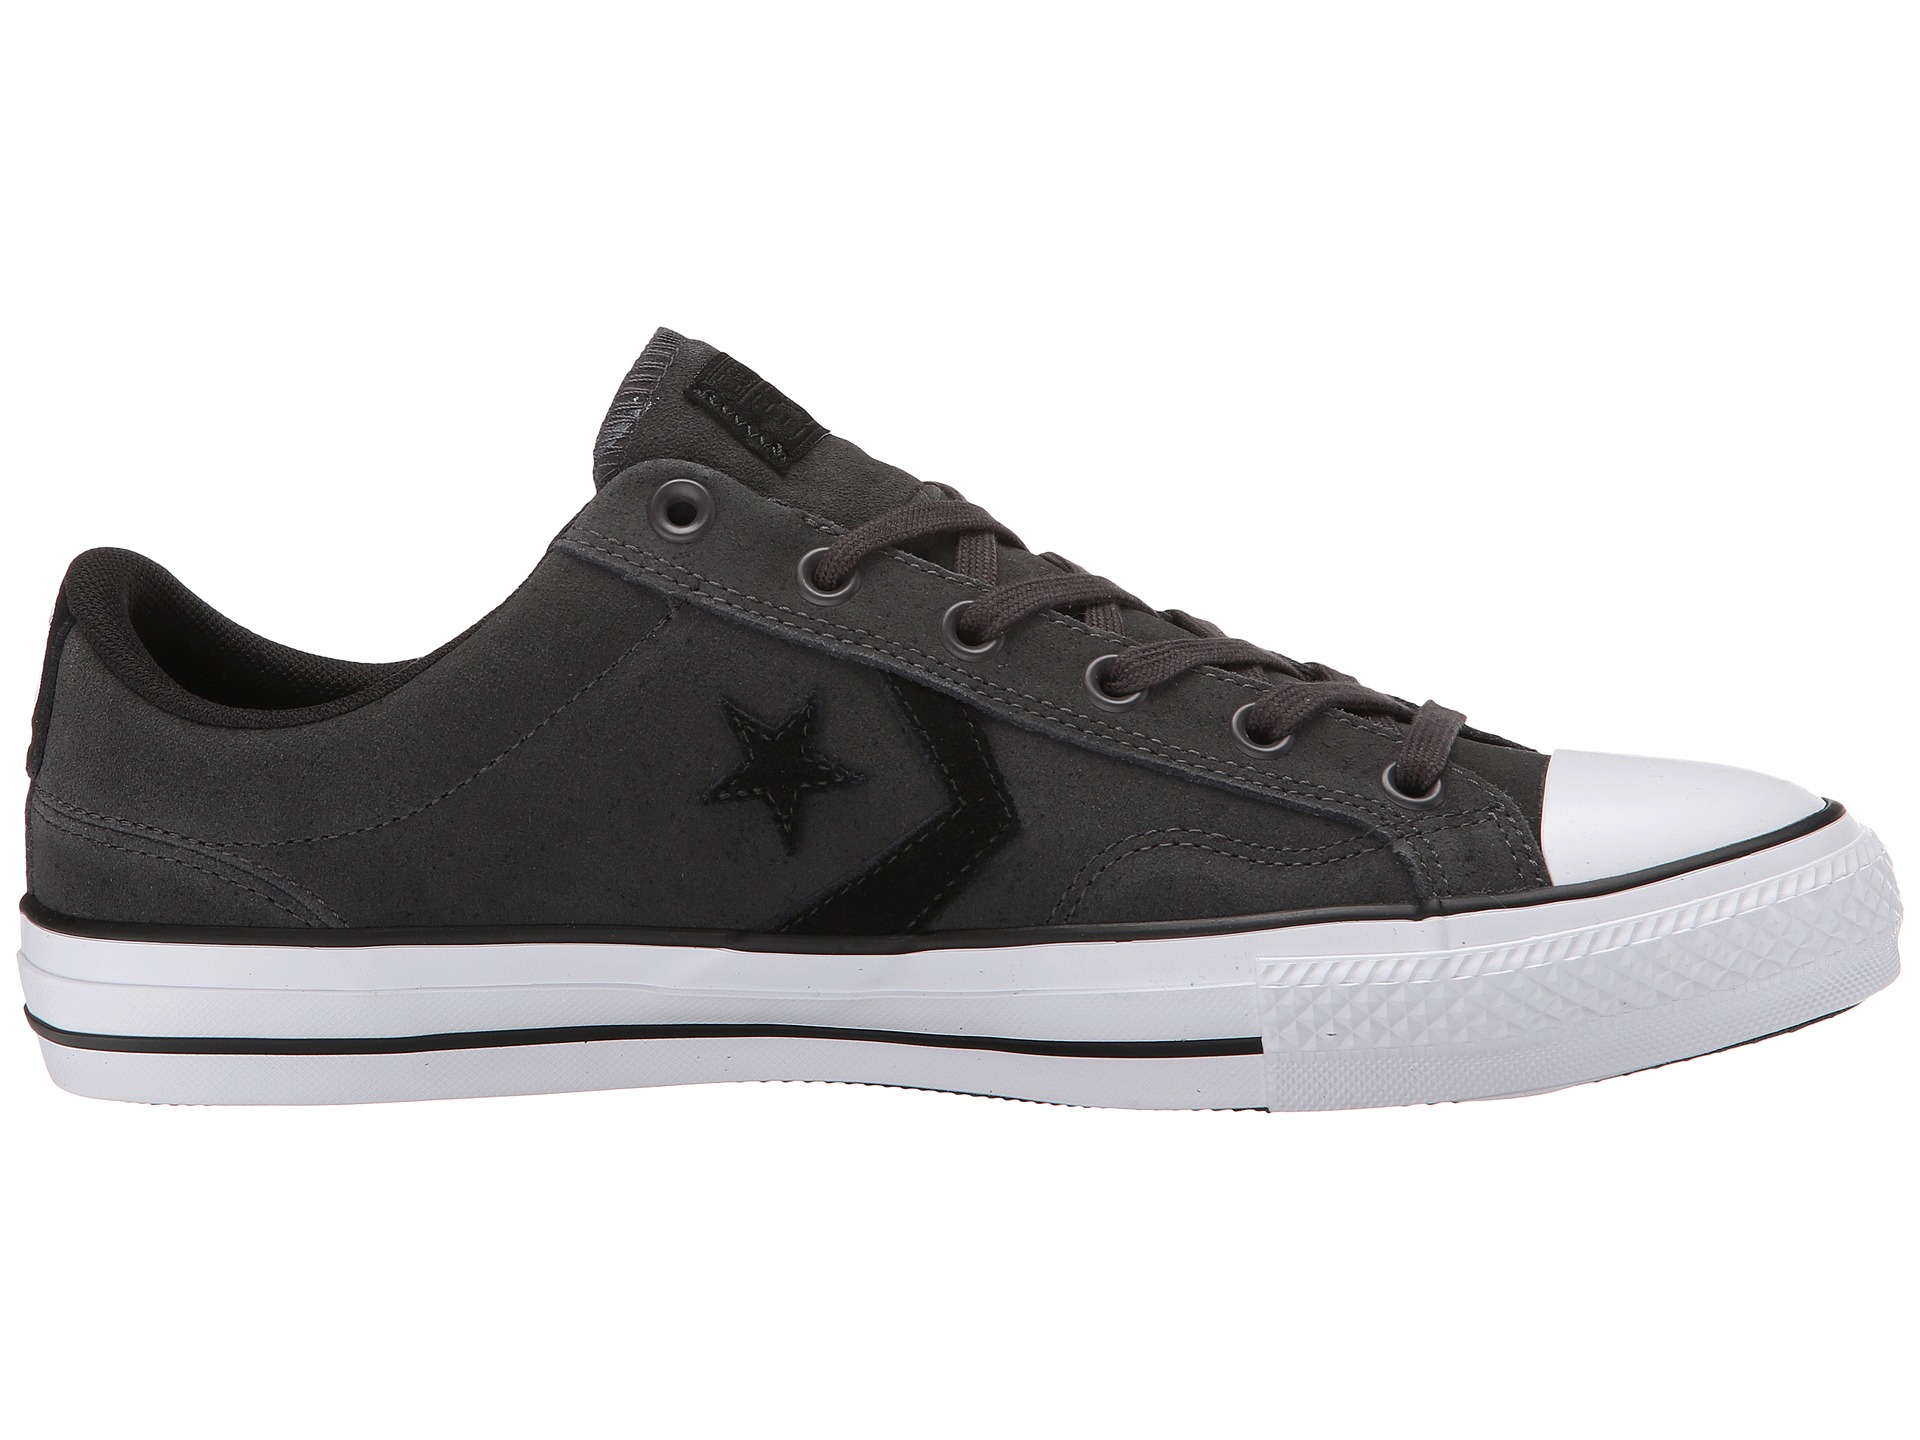 f8c3cfa665c6b1 Lyst - Converse Star Player Pro in Black for Men